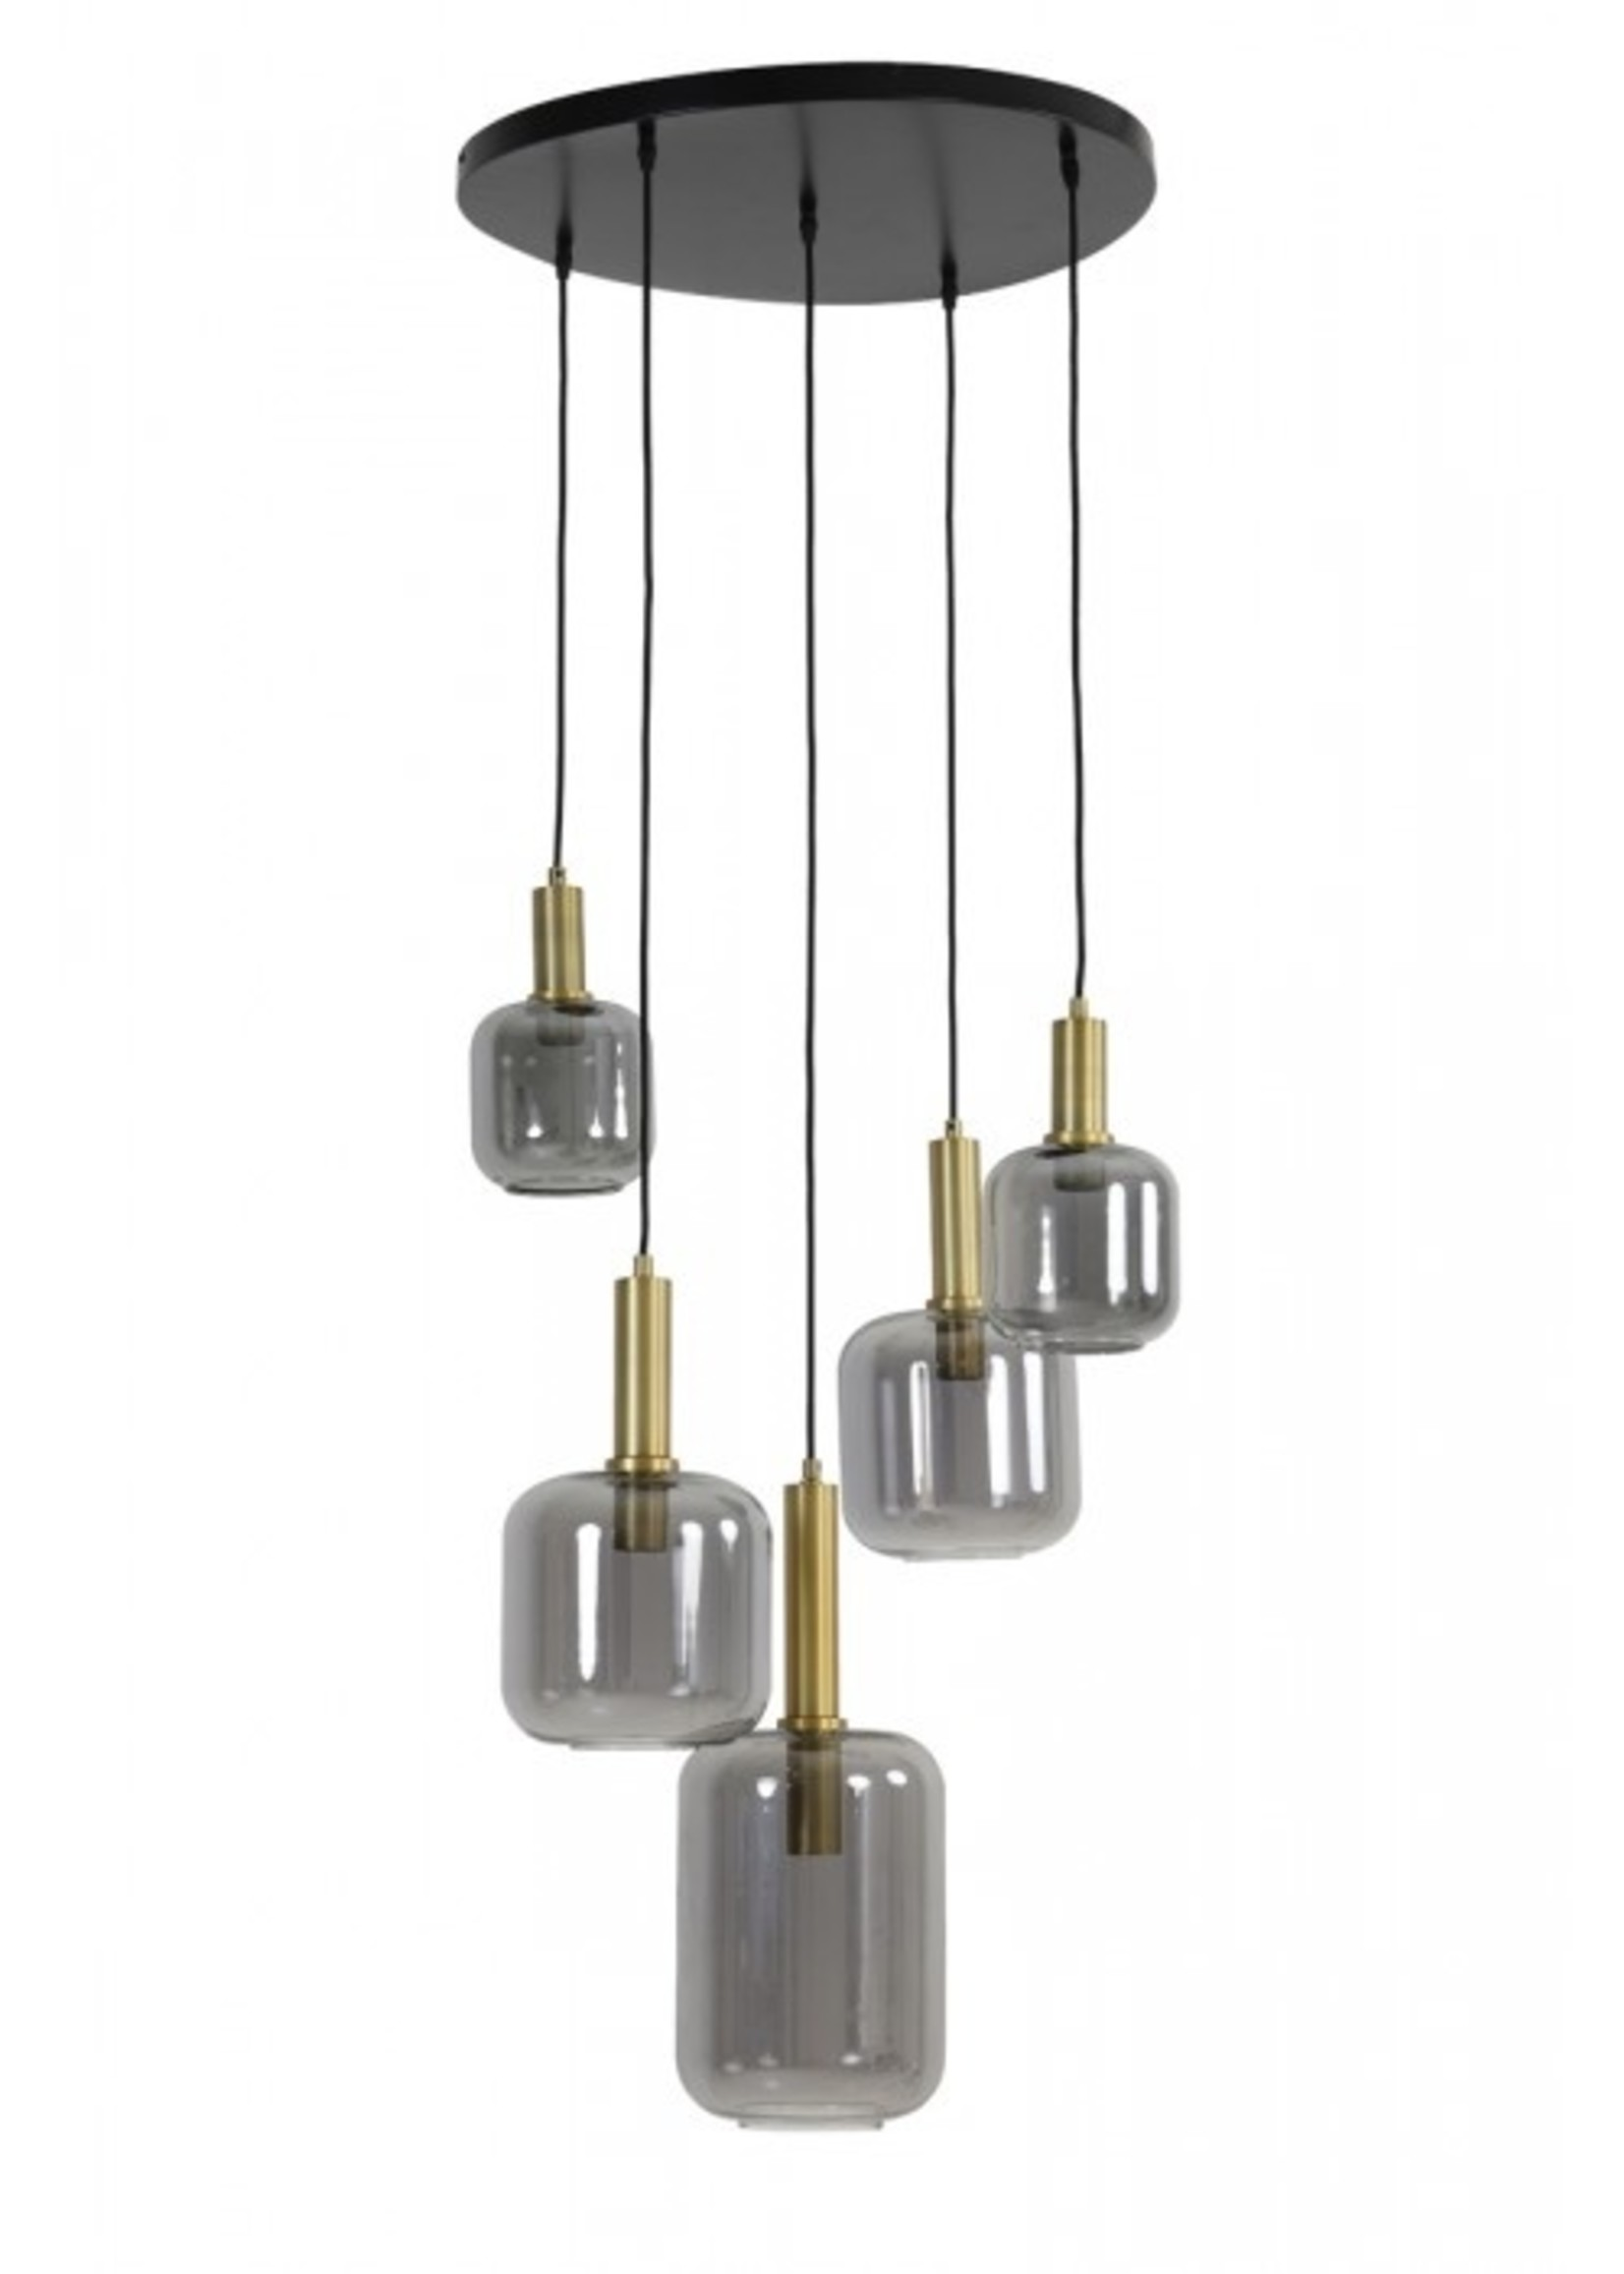 Light & Living Hanglamp 5L 66x80 LEKAR antiek brons